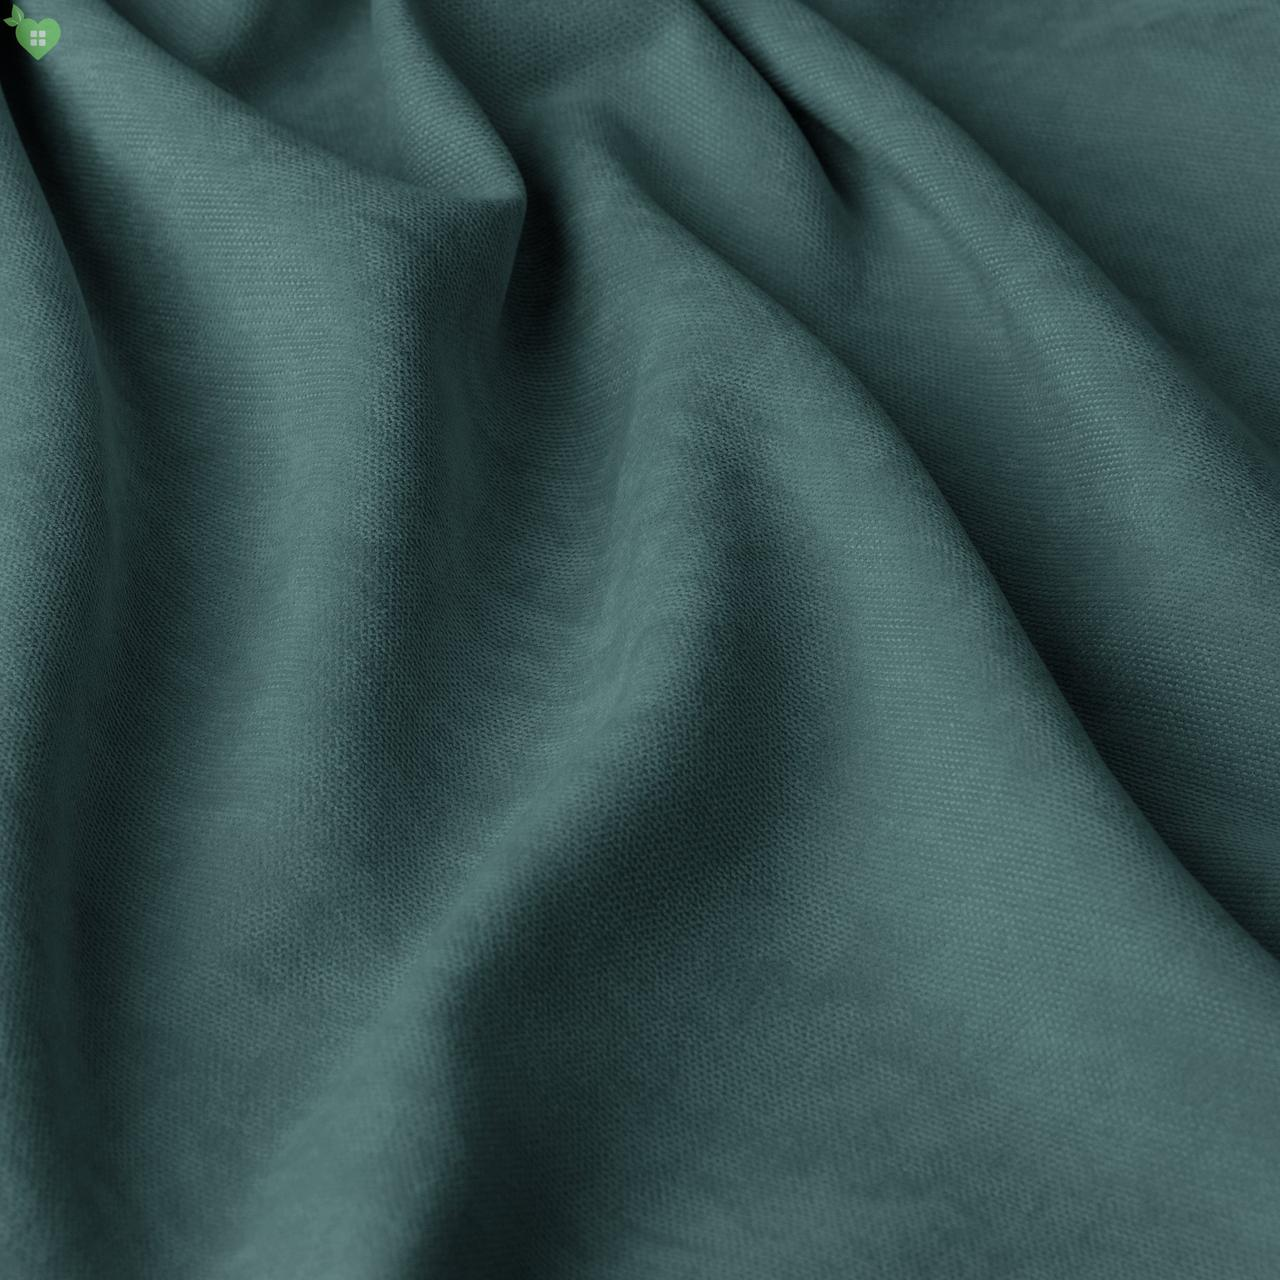 Однотонная декоративная ткань велюр синий Турция 84364v18